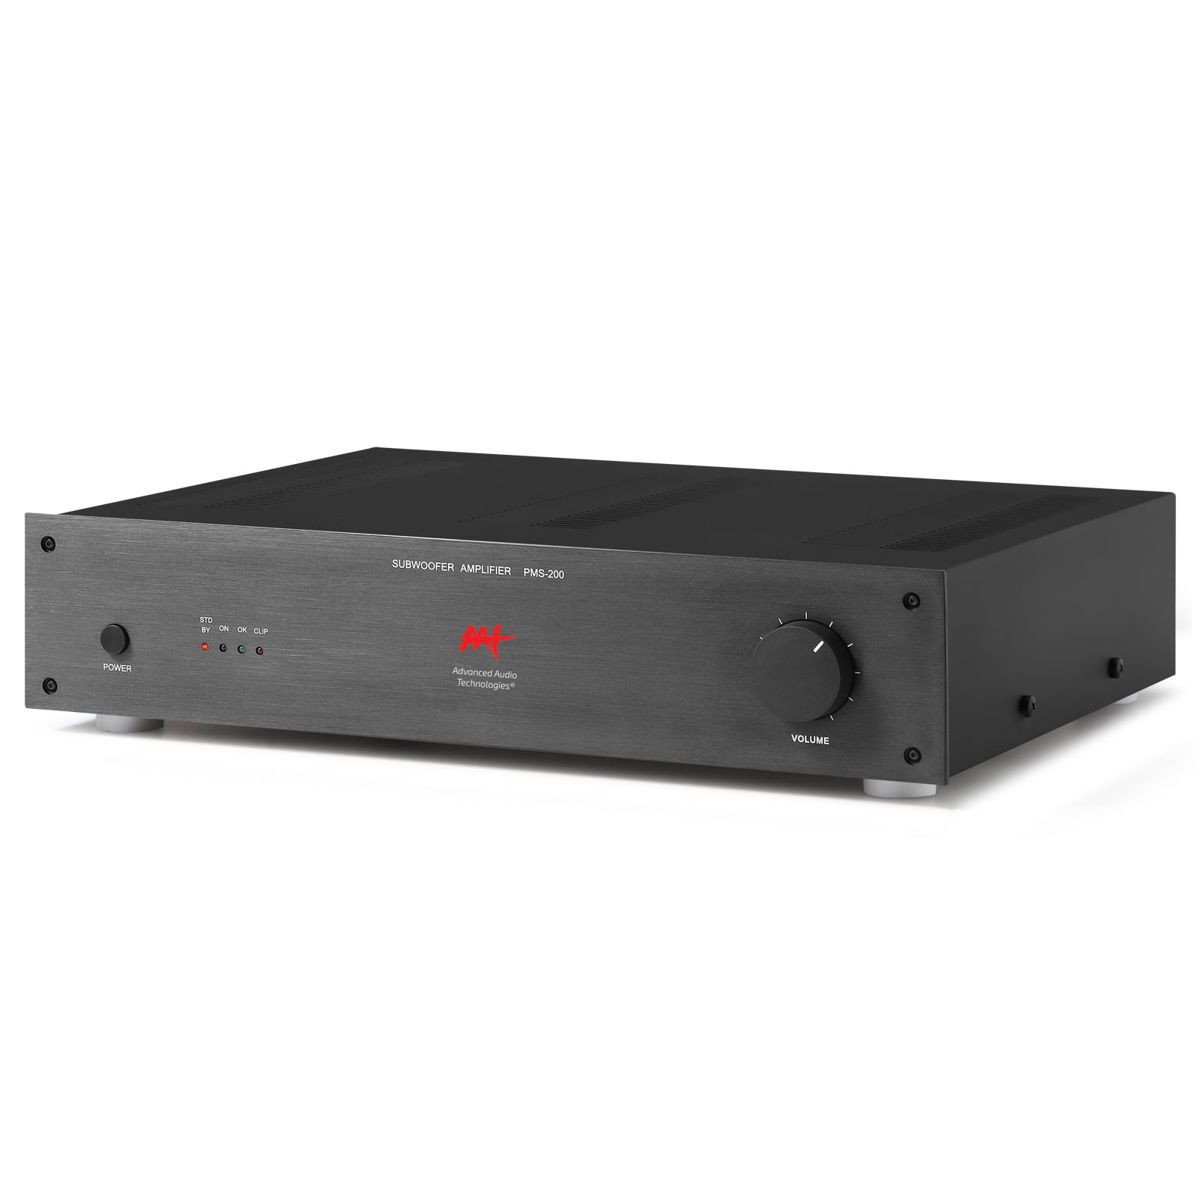 Amplificador Para Subwoofer Passivo 200W RMS / PMS-200 AAT